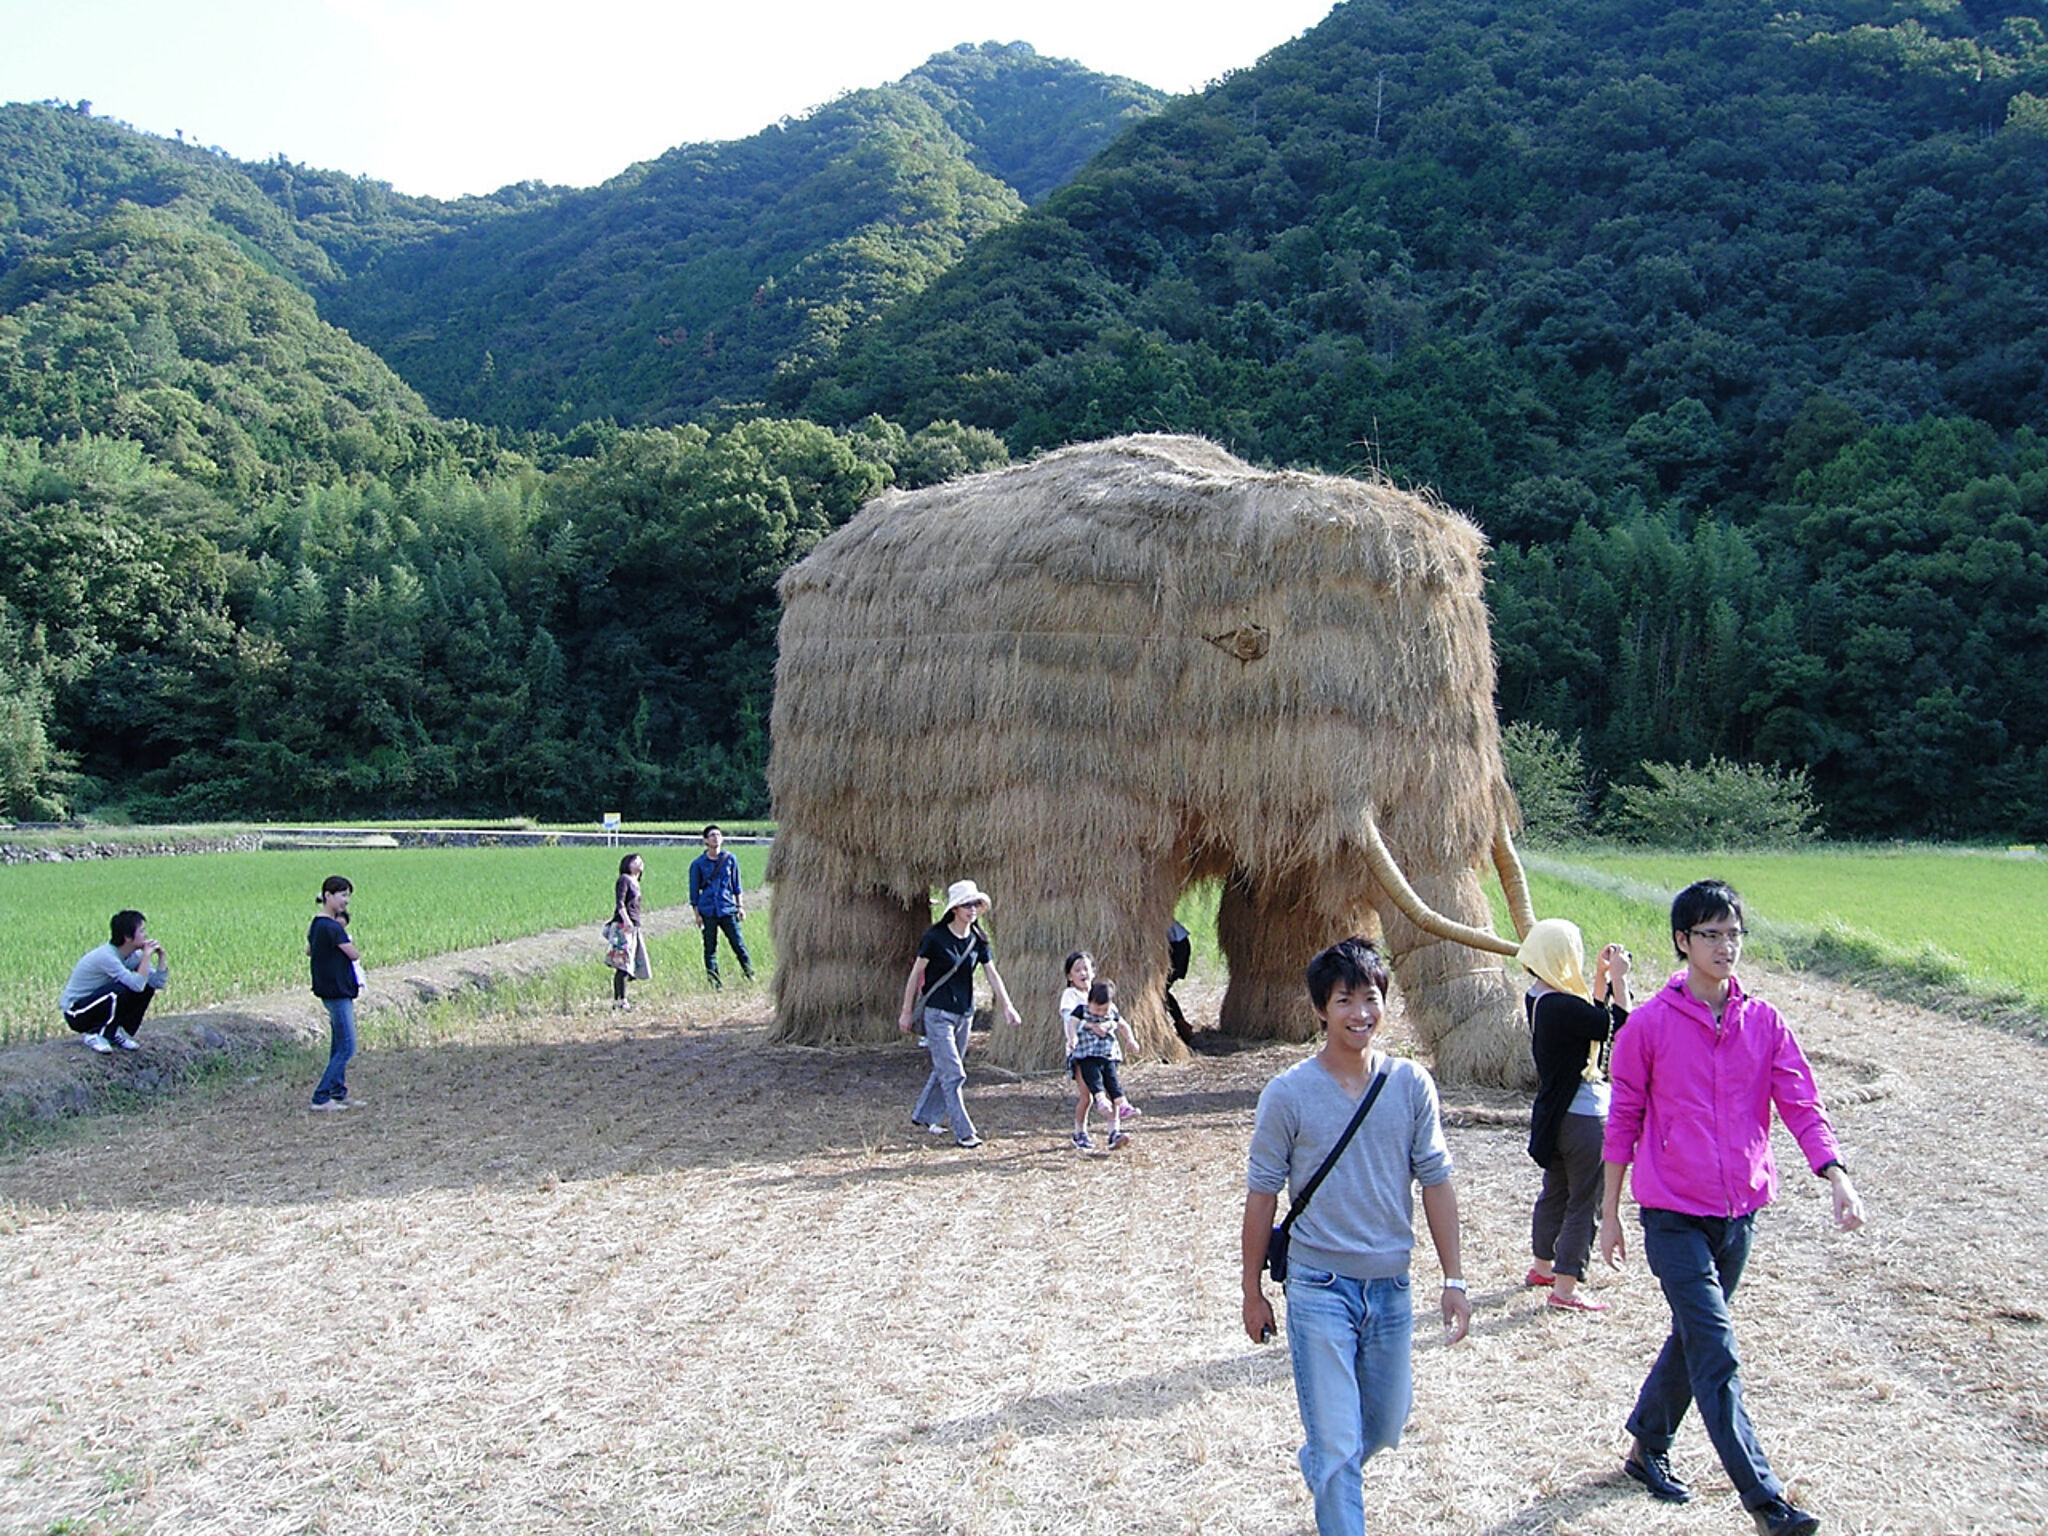 瀬戸内国際芸術祭の画像